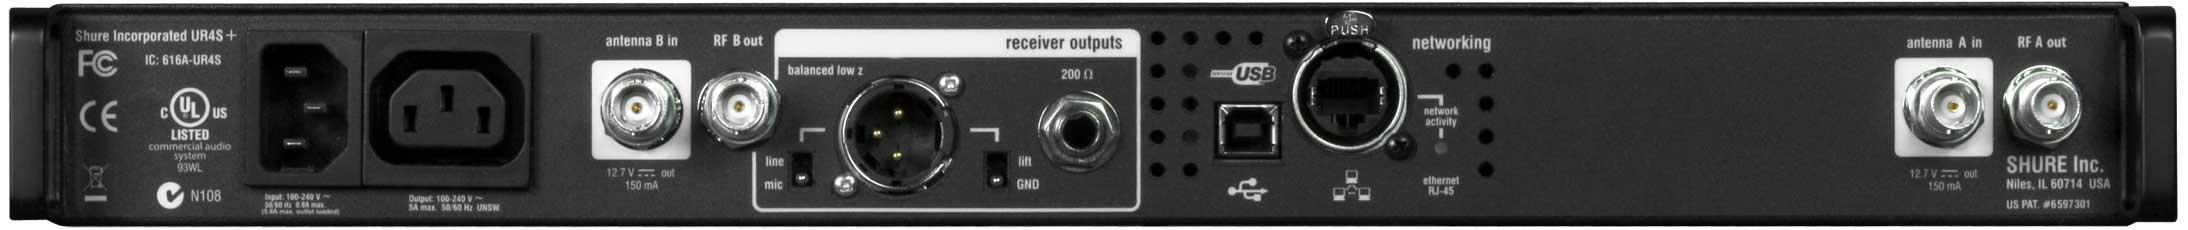 Single UHF-R Receiver G1 (470-530)